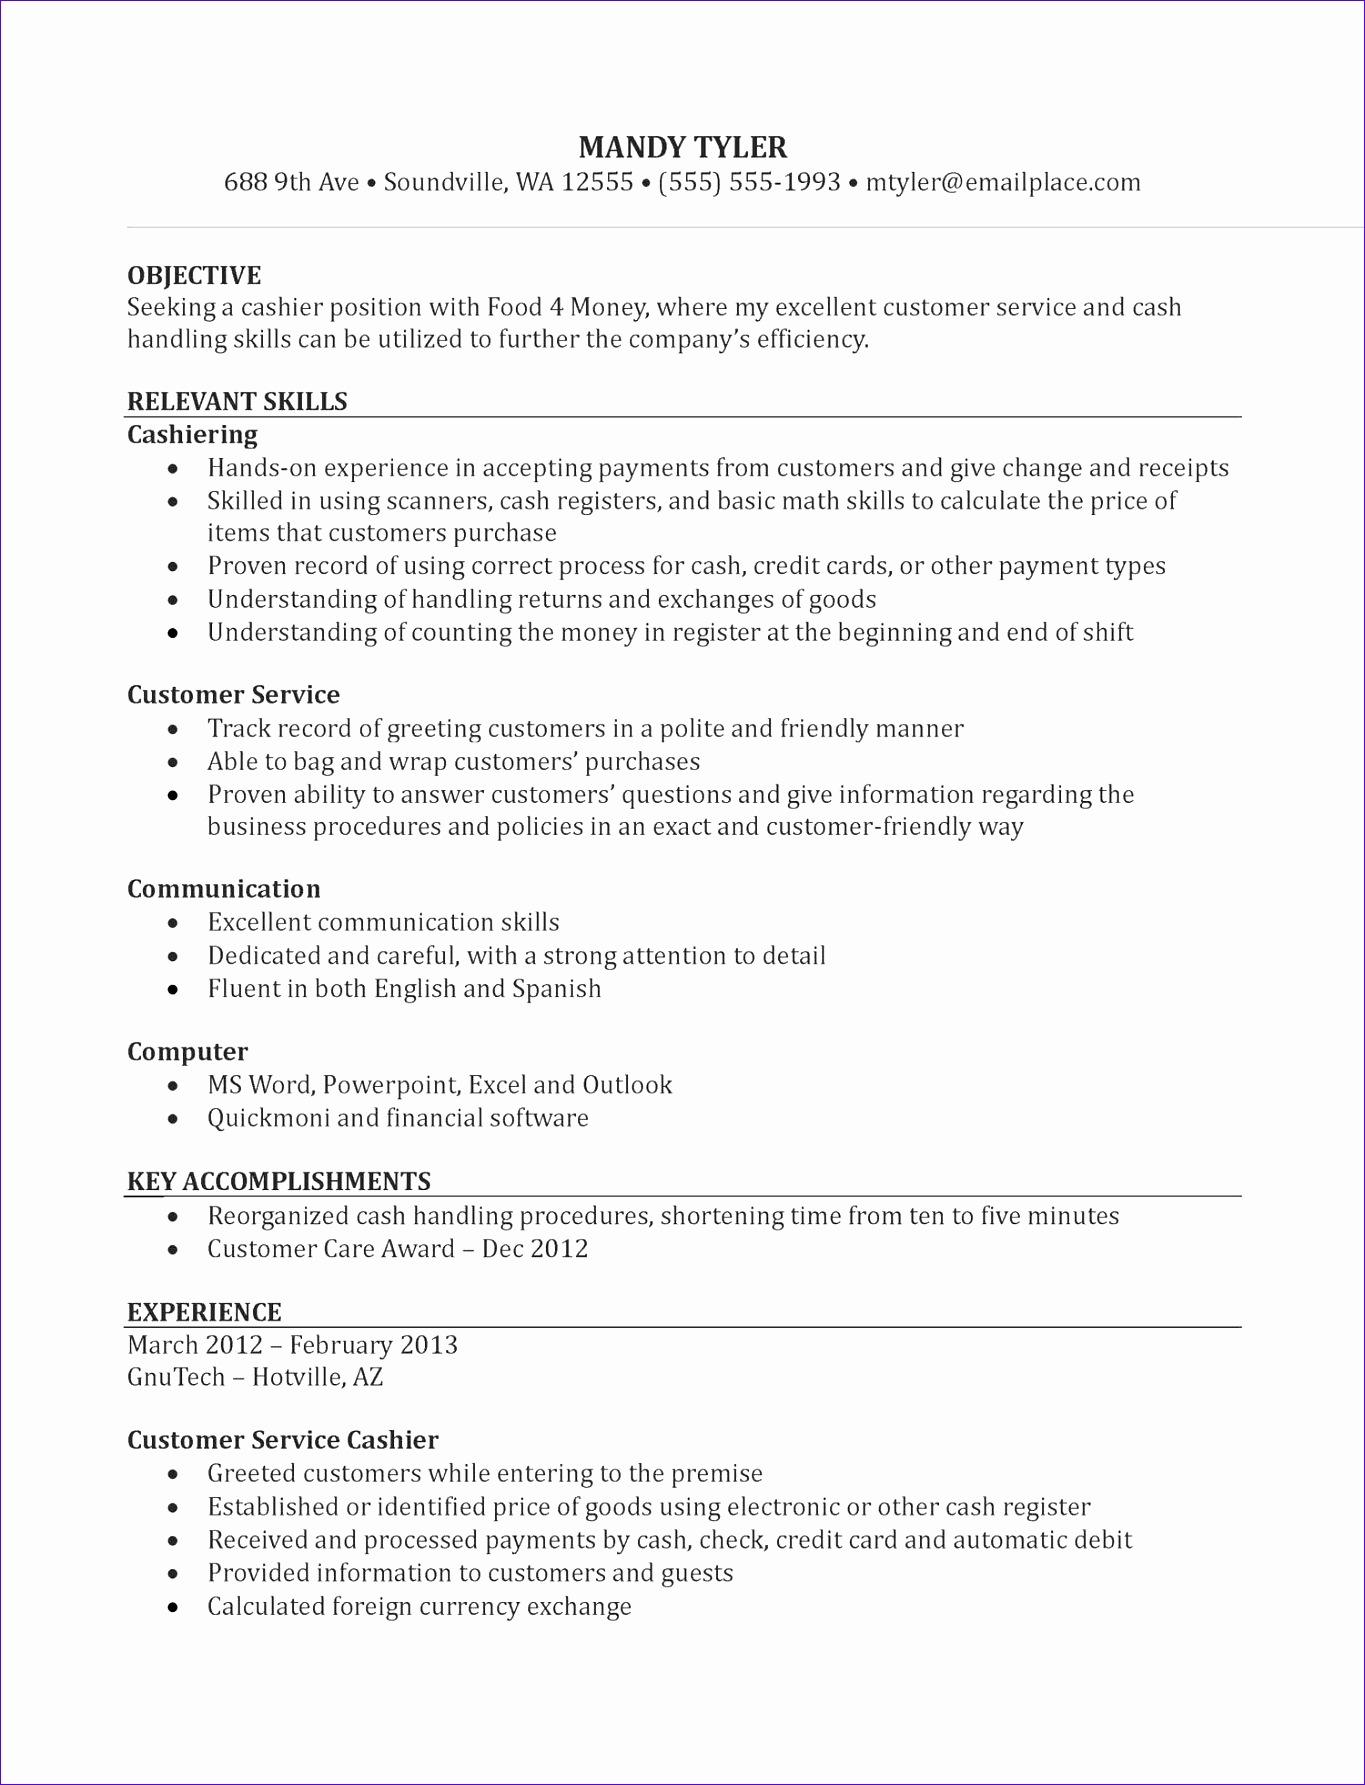 retail job description for resume printable retail job description for resume retail merchandiser job description for resume retail cashier job description for resume retail supervisor